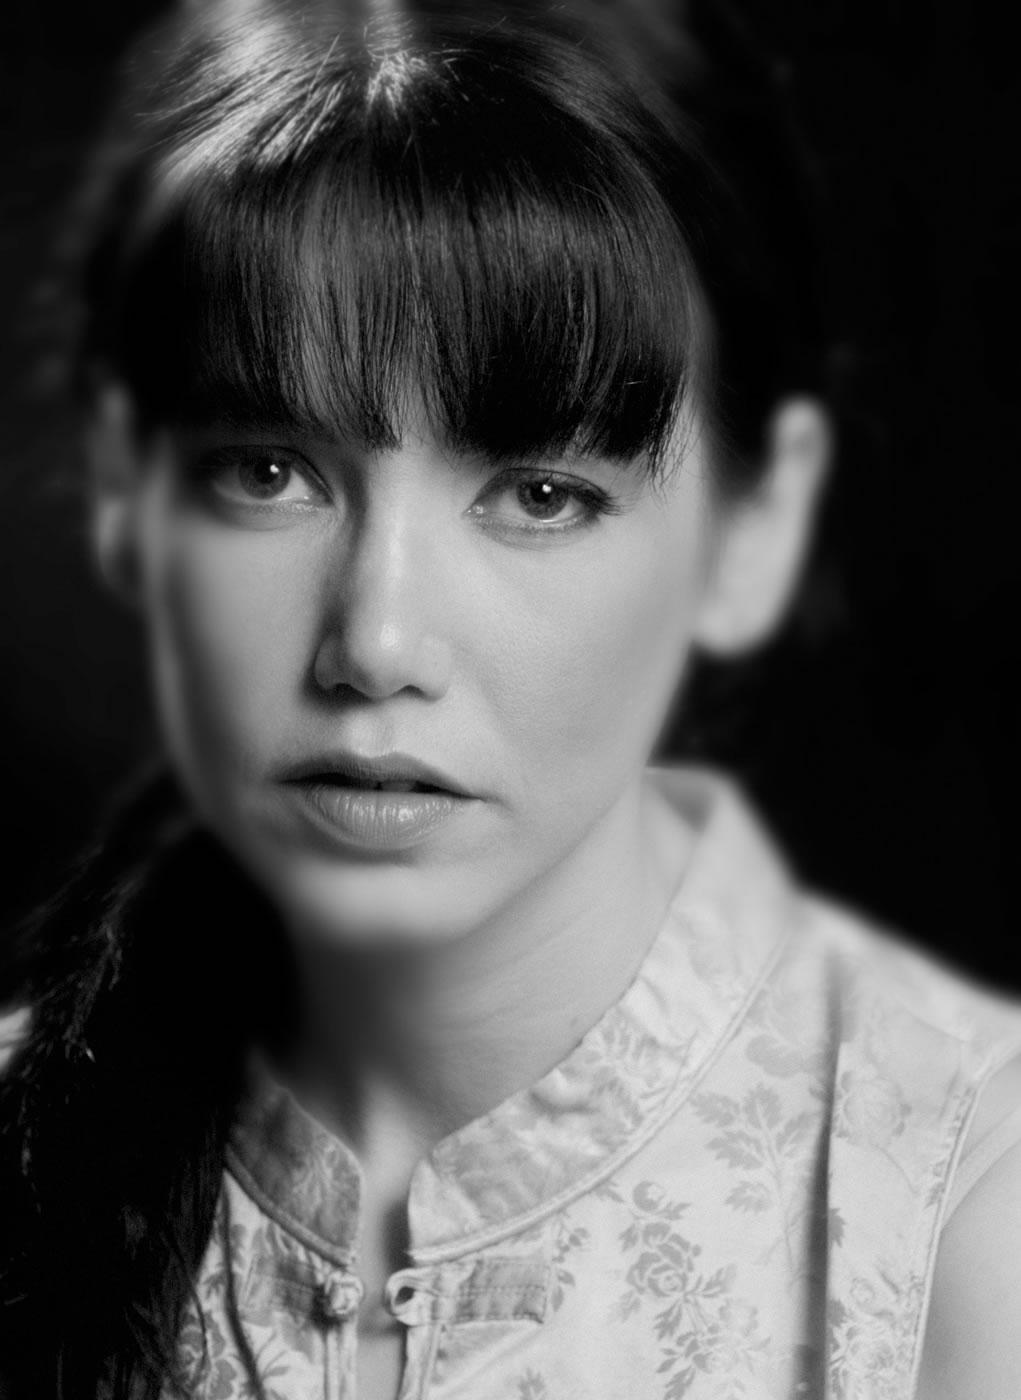 Valerie morgan